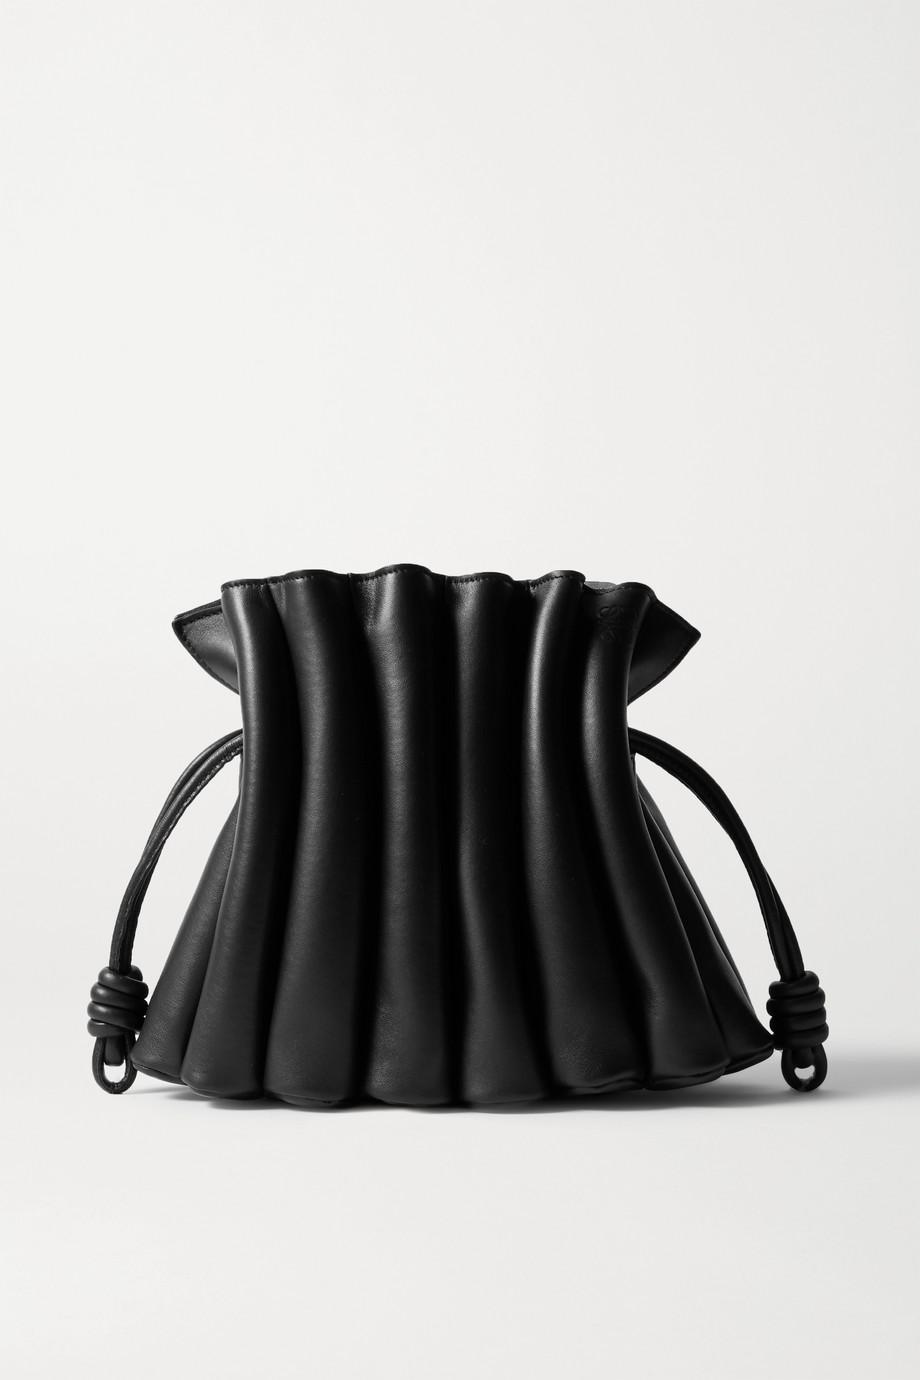 Loewe Flamenco Ondas pleated leather clutch